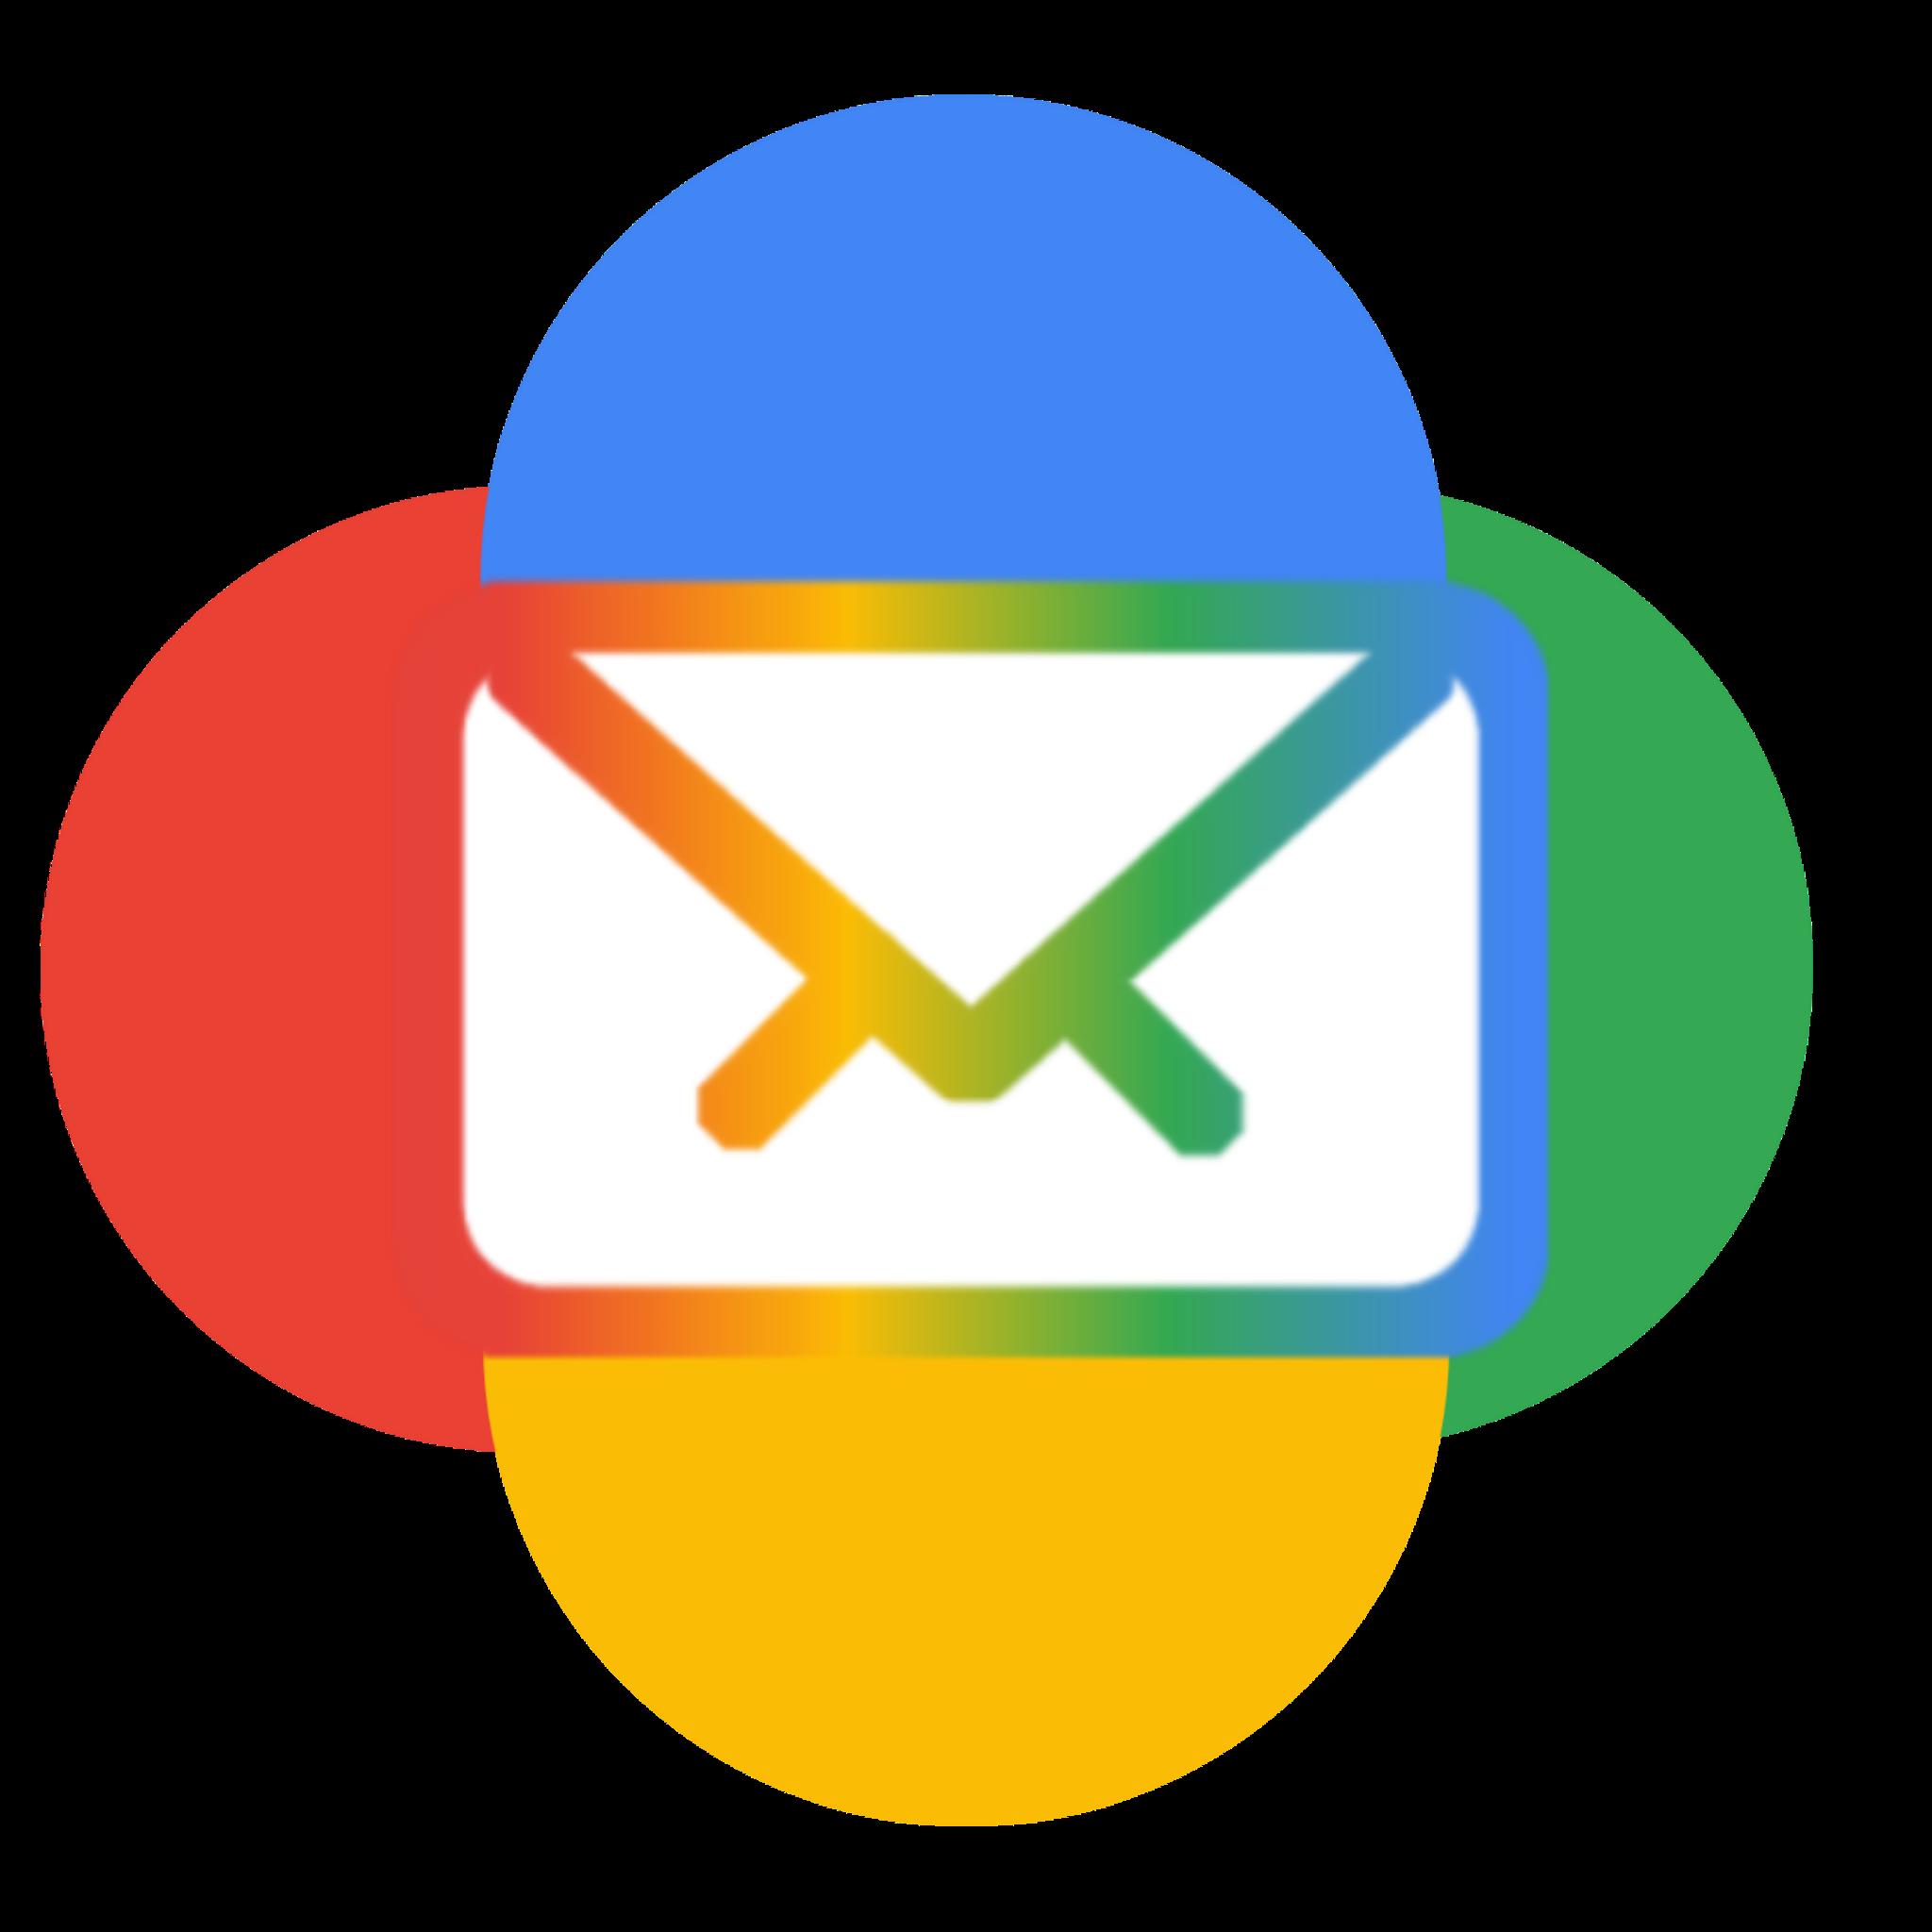 Gmail logo redesign